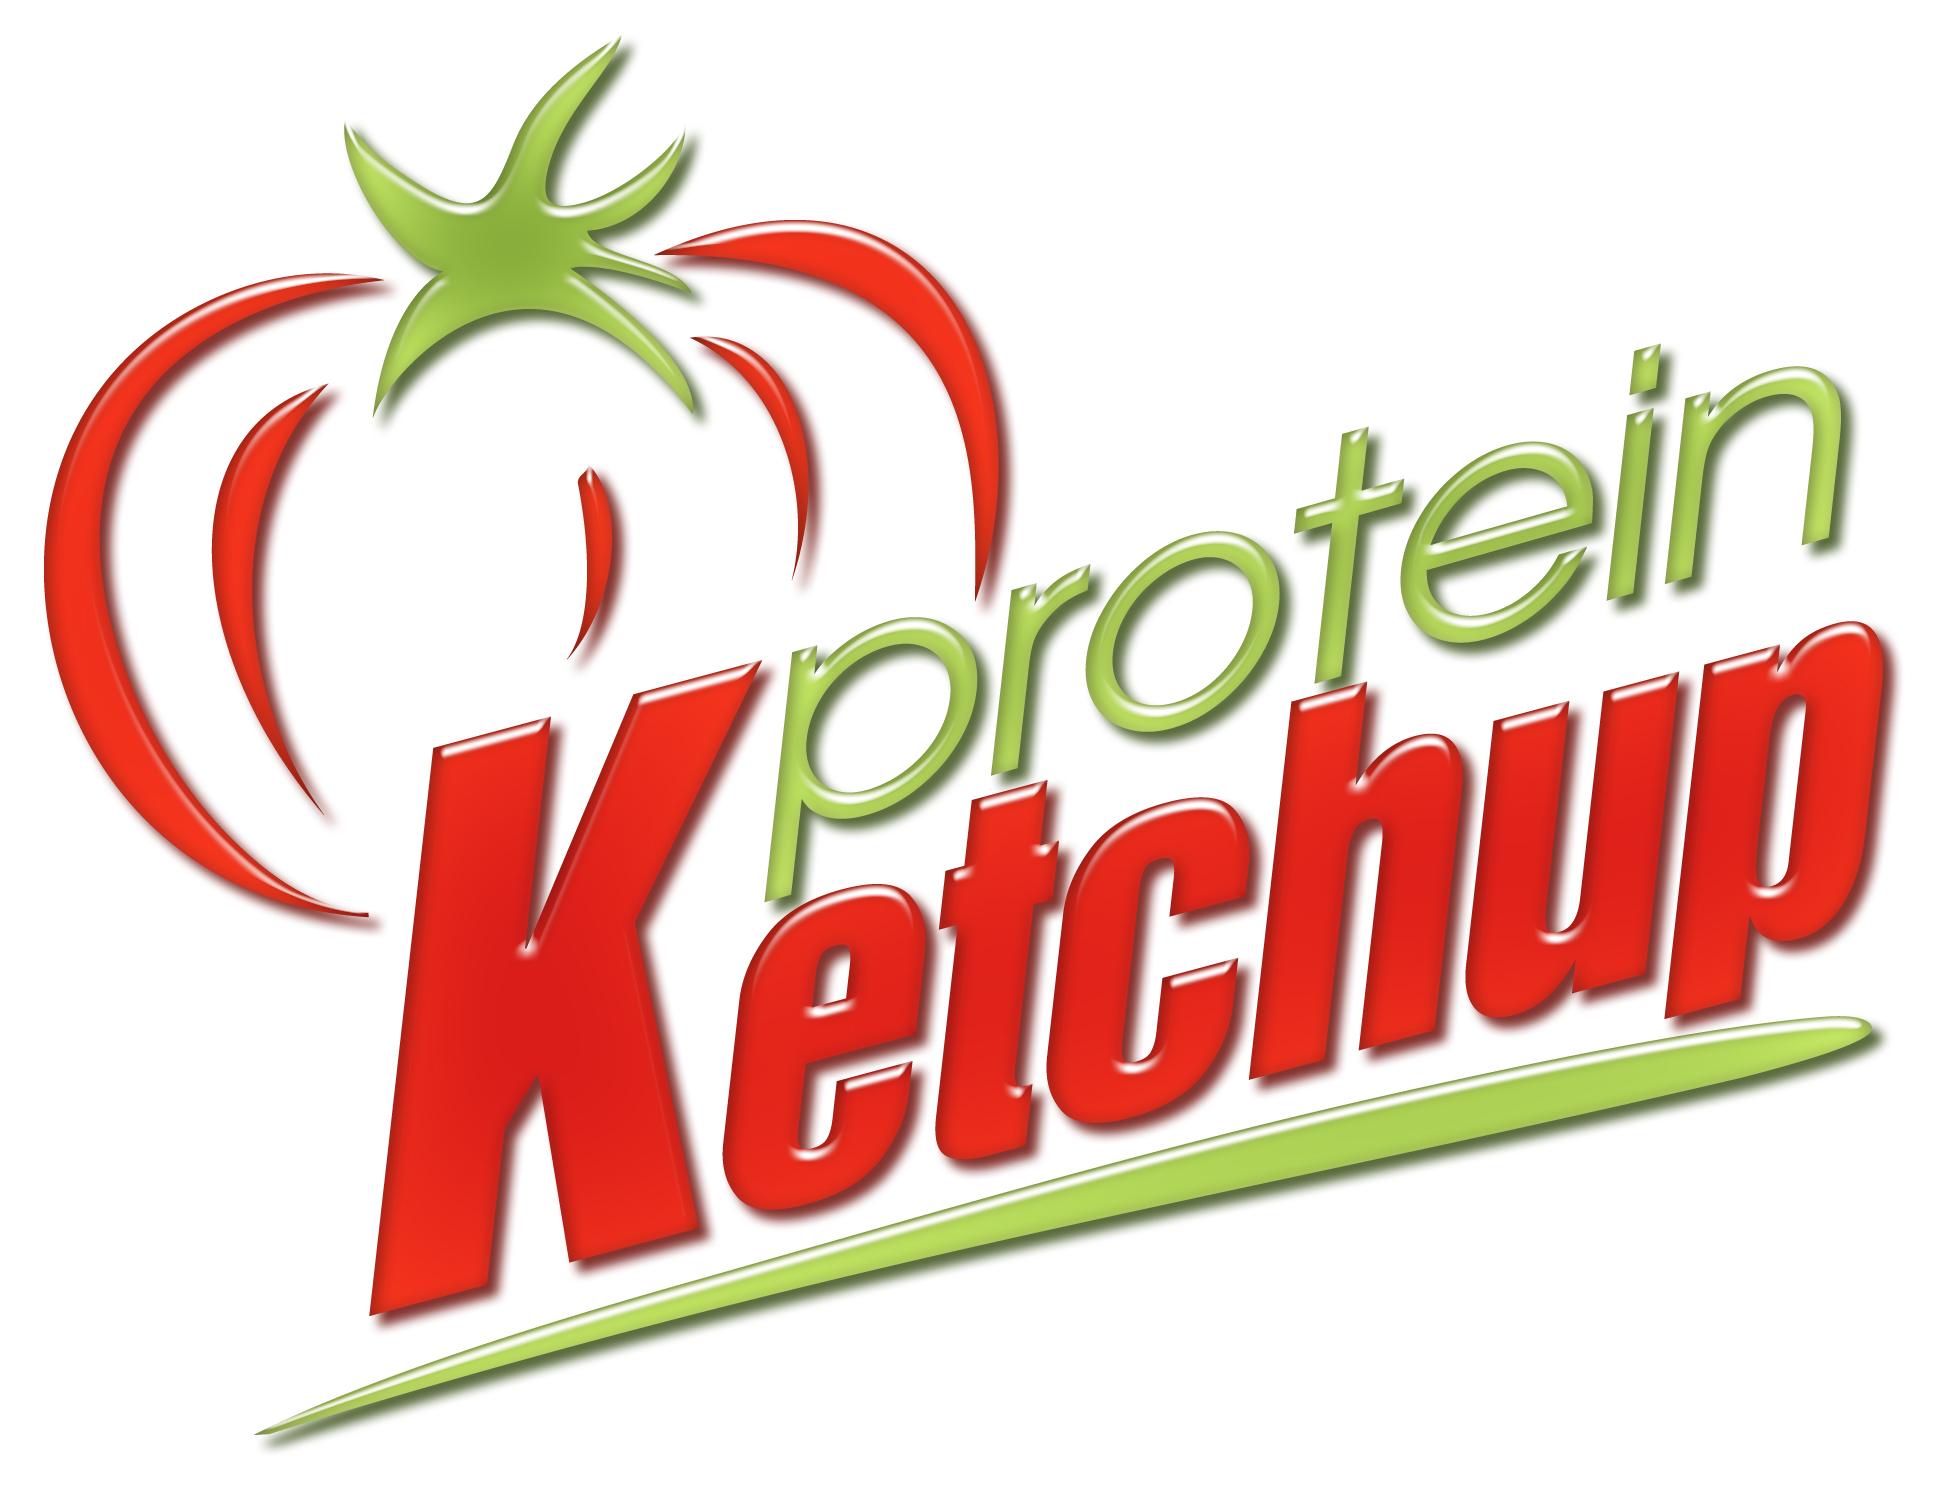 protica introduces first healthy ketchup rh prweb com ketchup logo logo ketchup heinz